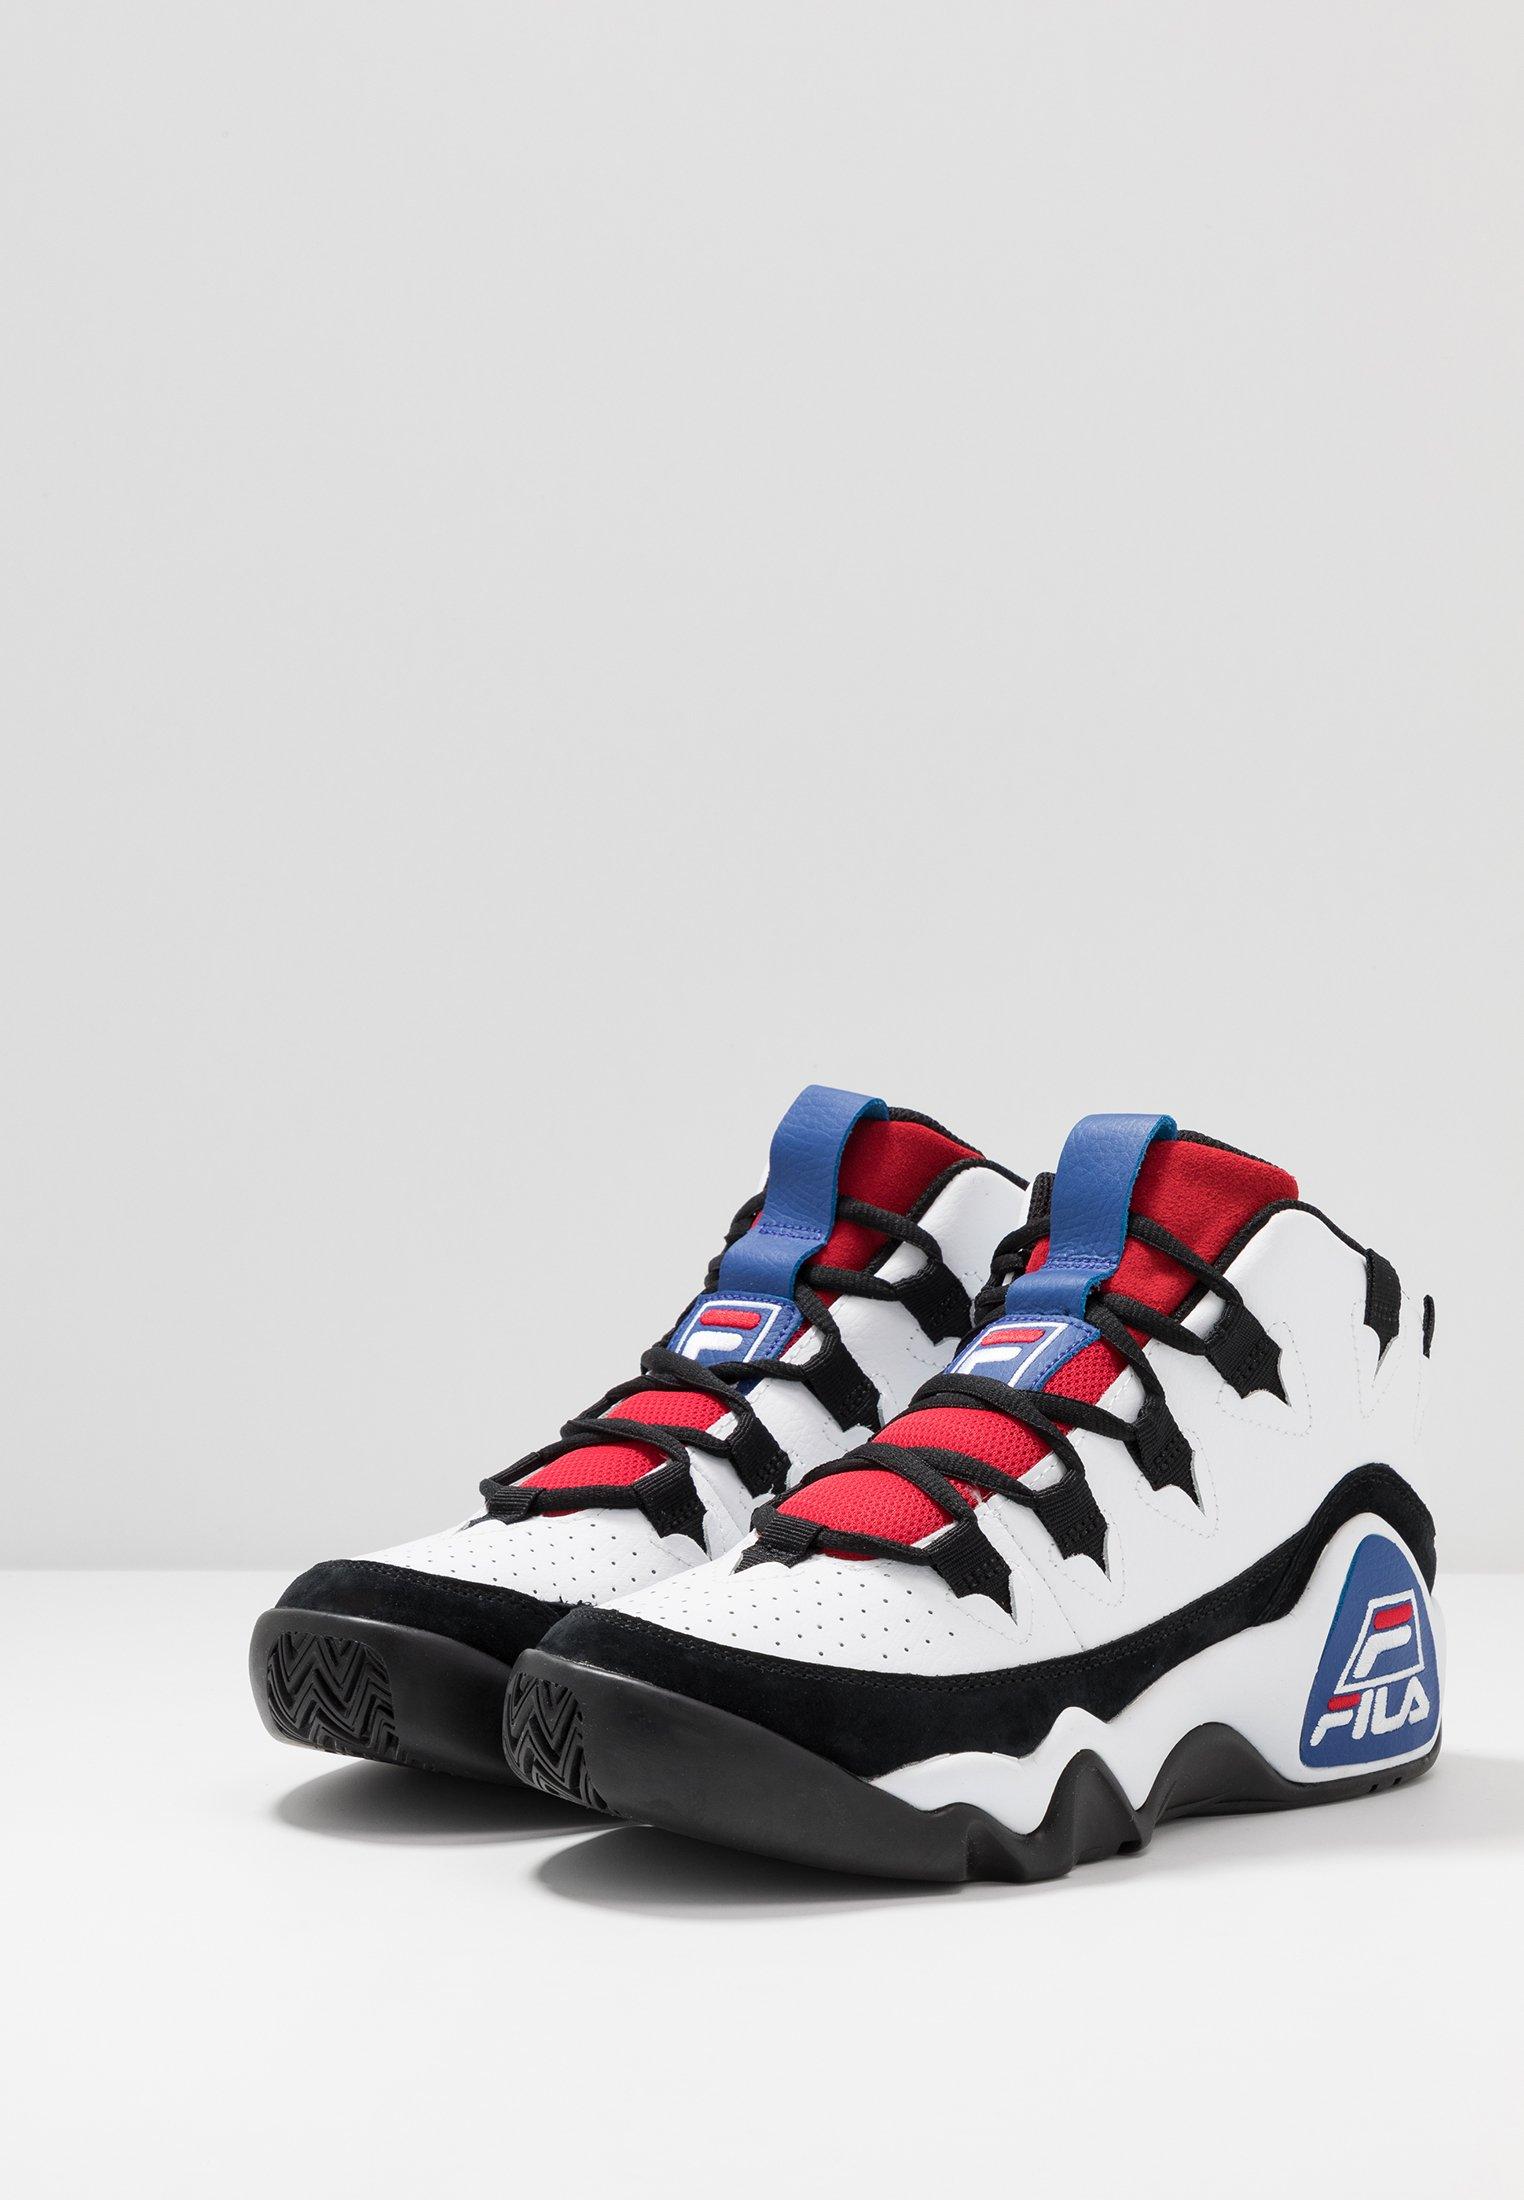 Fila 95 Grant Hill - Baskets Montantes White/black/red